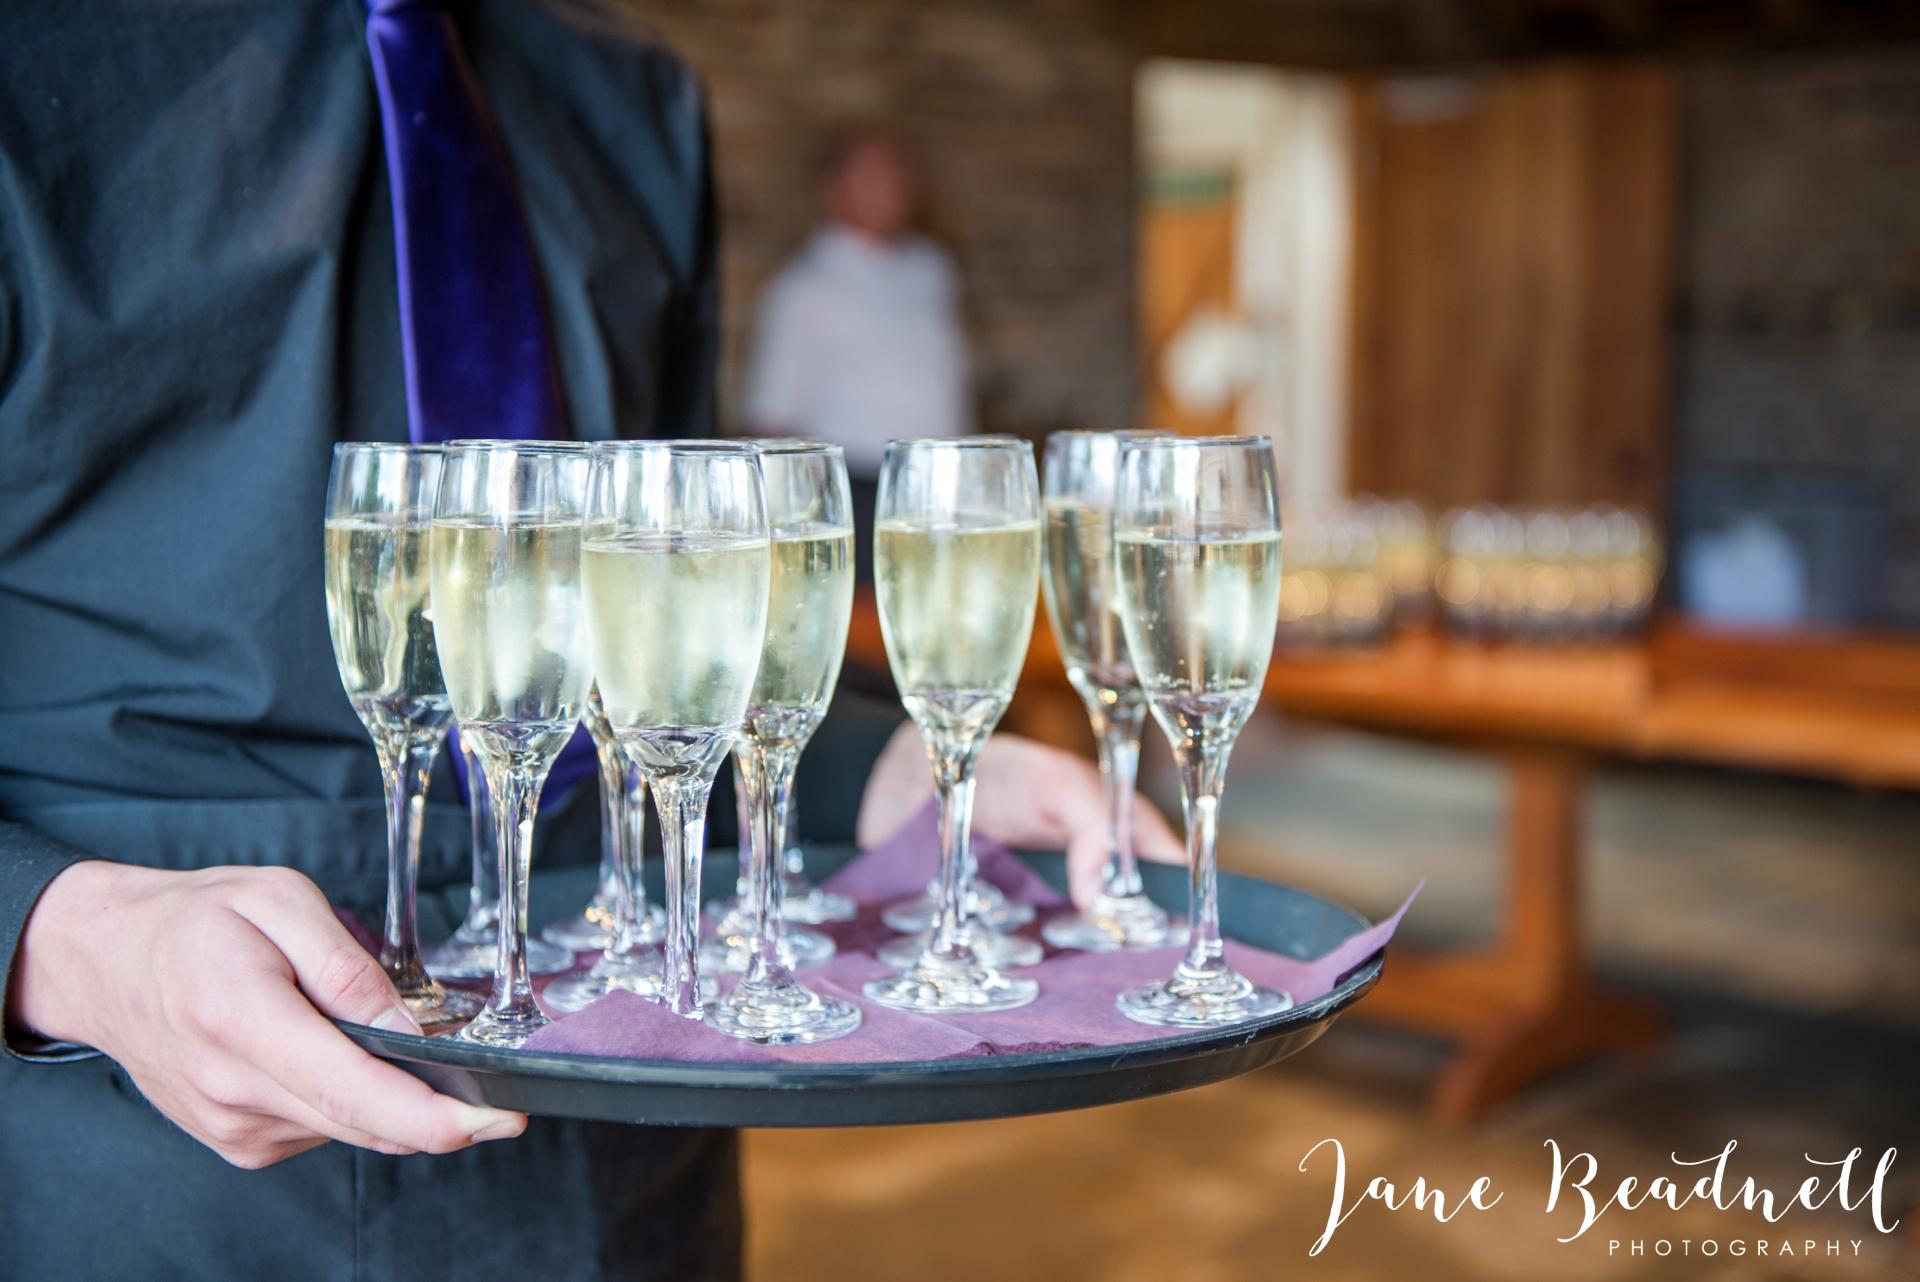 yorkshire-fine-art-wedding-photographer-jane-beadnell-photography-poppleton-york_0068